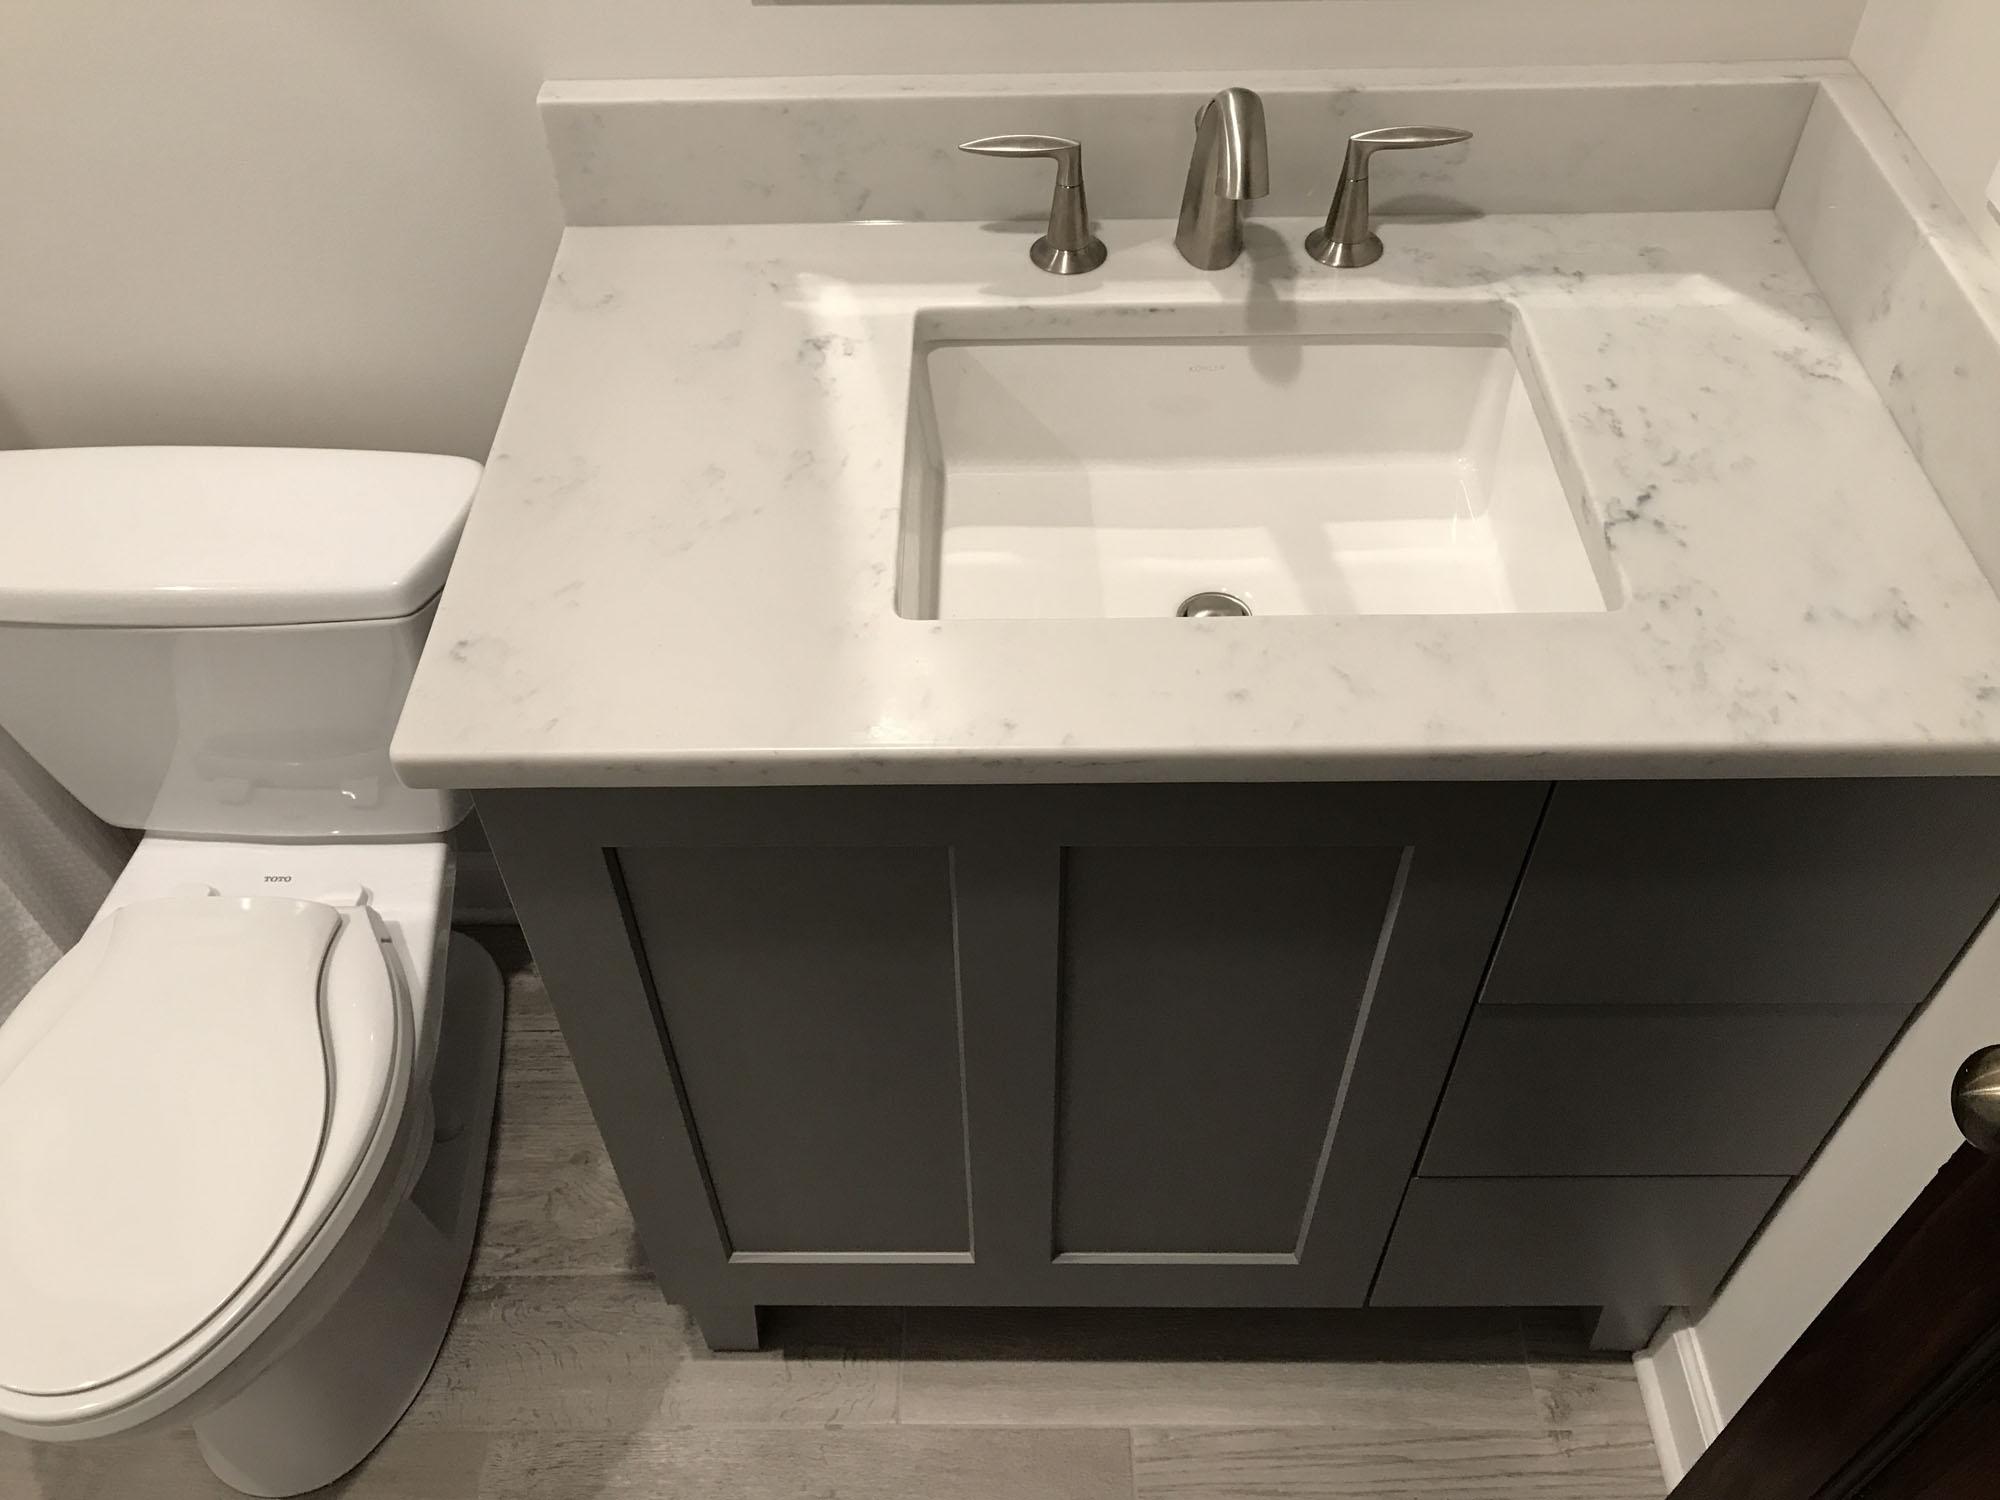 Bathroom Remodeling In Morton Grove Sunny Construction